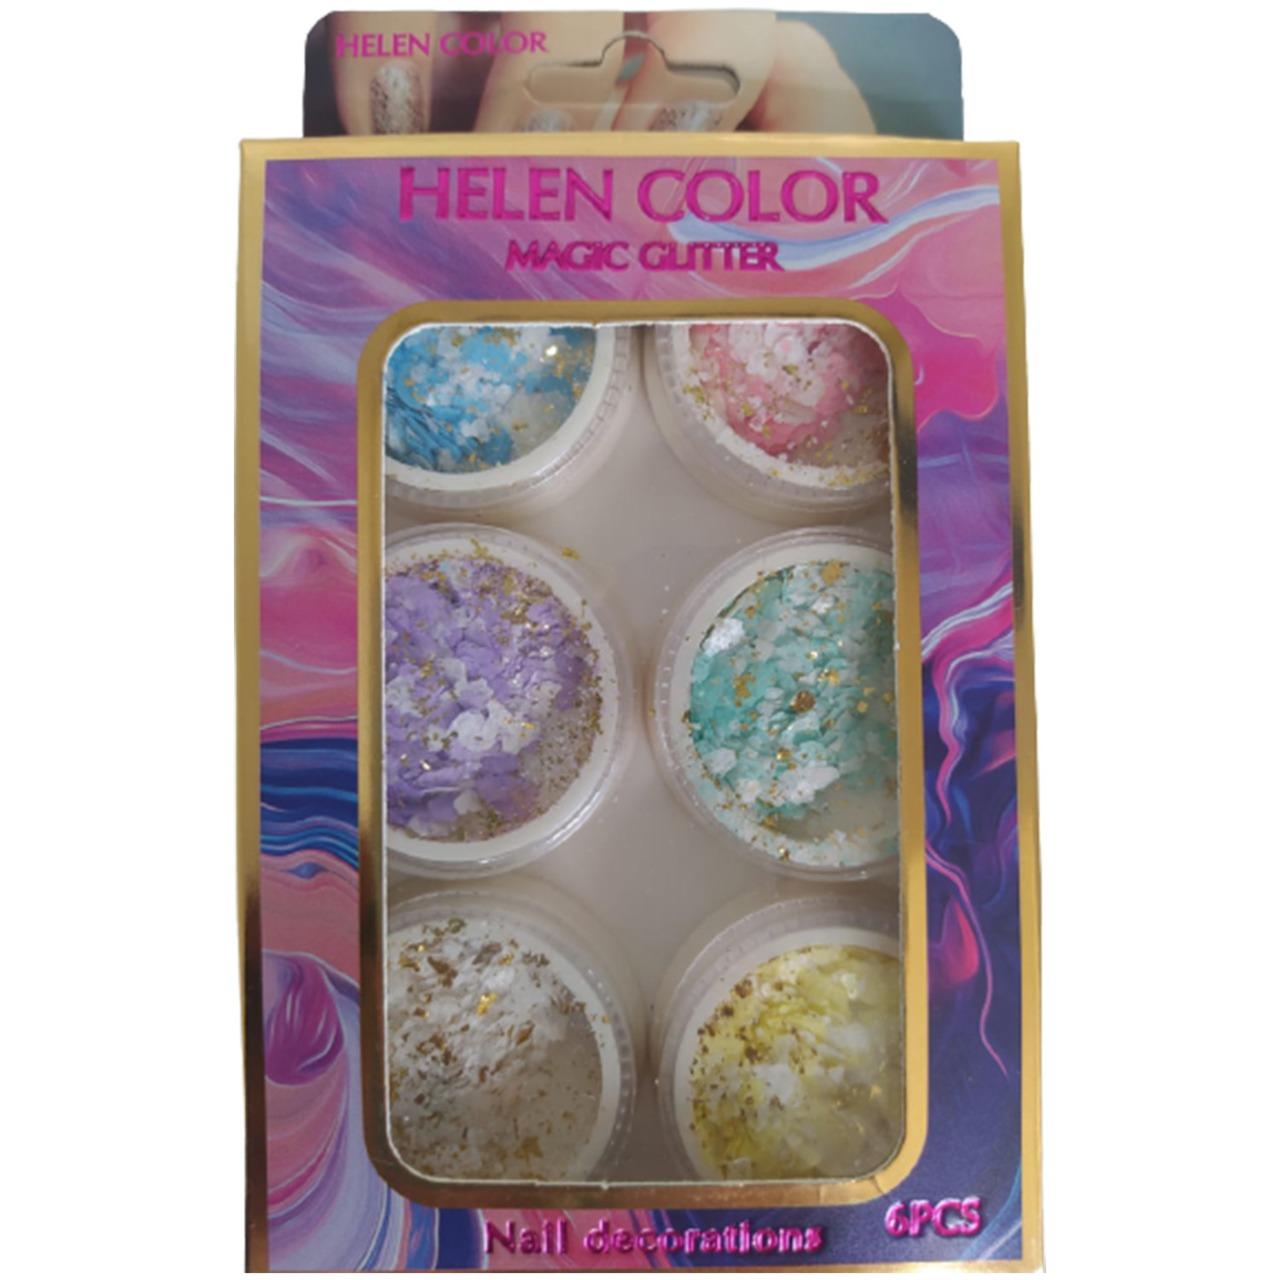 Kit Glitter Papel Com Fio de Ouro Helen Color - 6 unidades